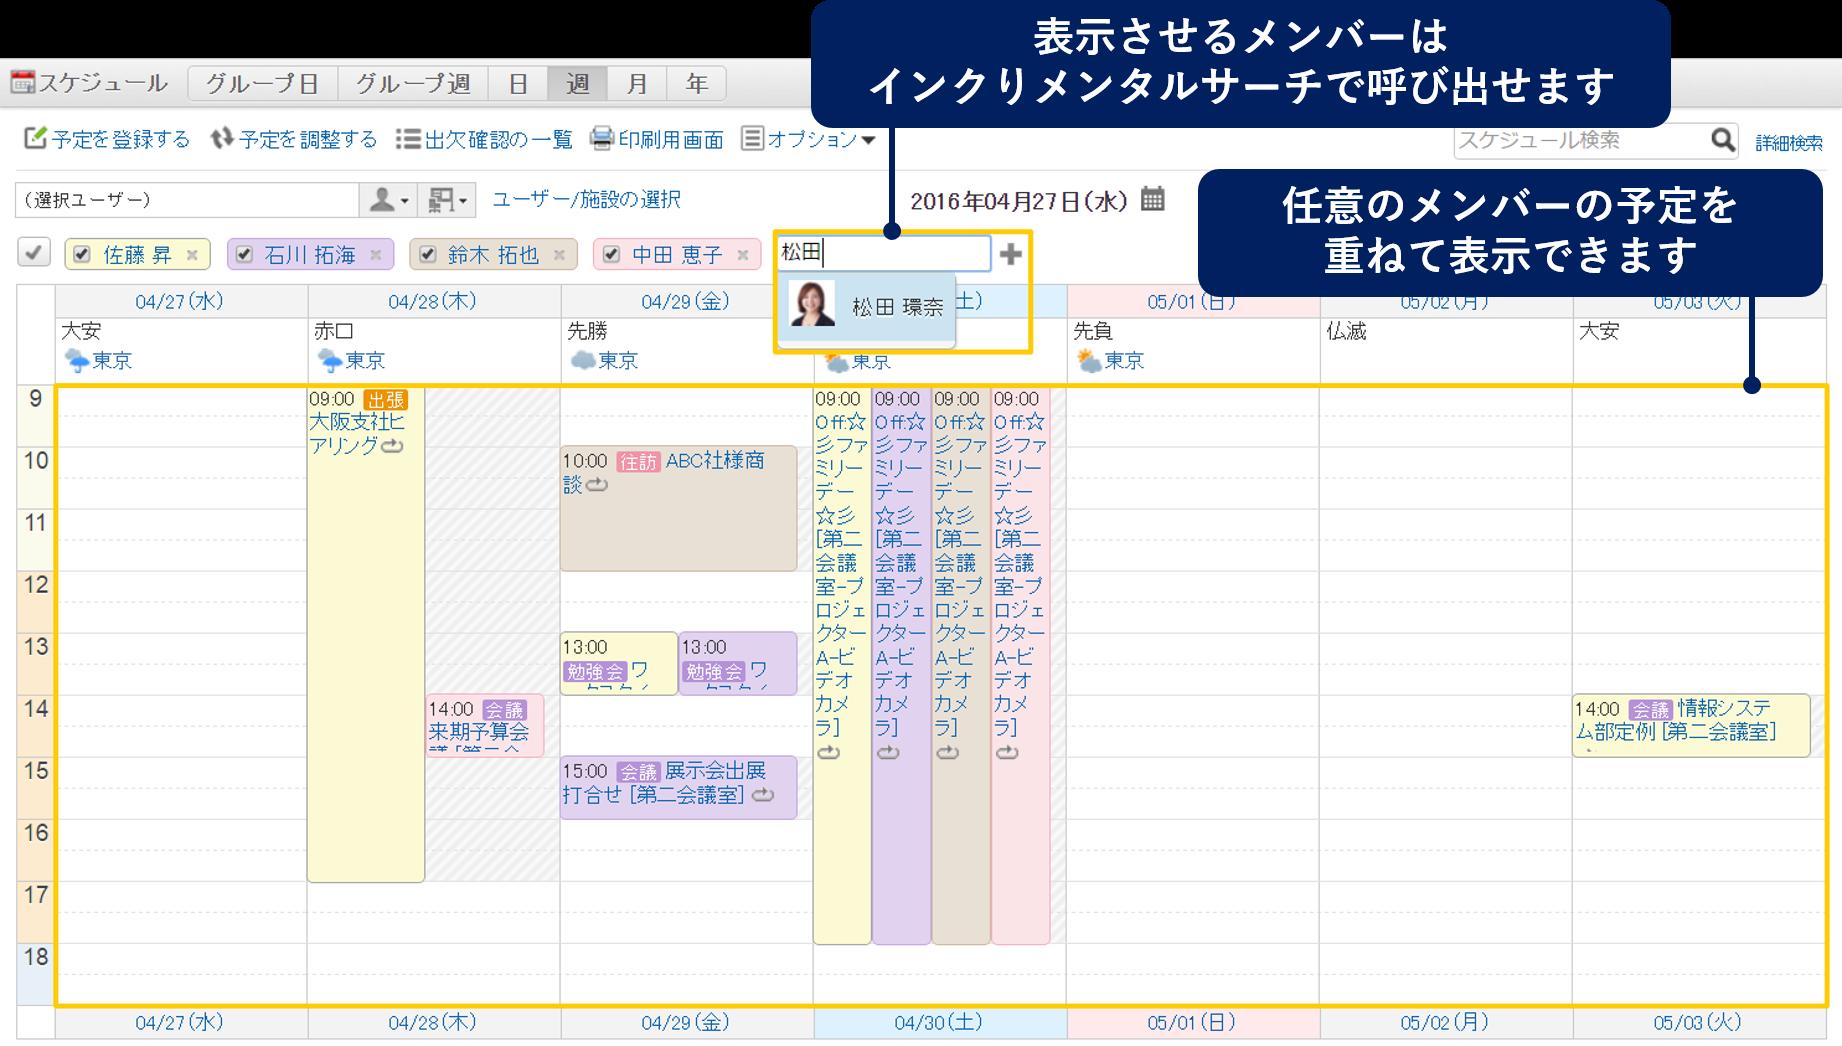 https://enterprise.cybozu.co.jp/2016/04/dfbcbdf434f09f8a141f9701d84ec473f66aeece.png